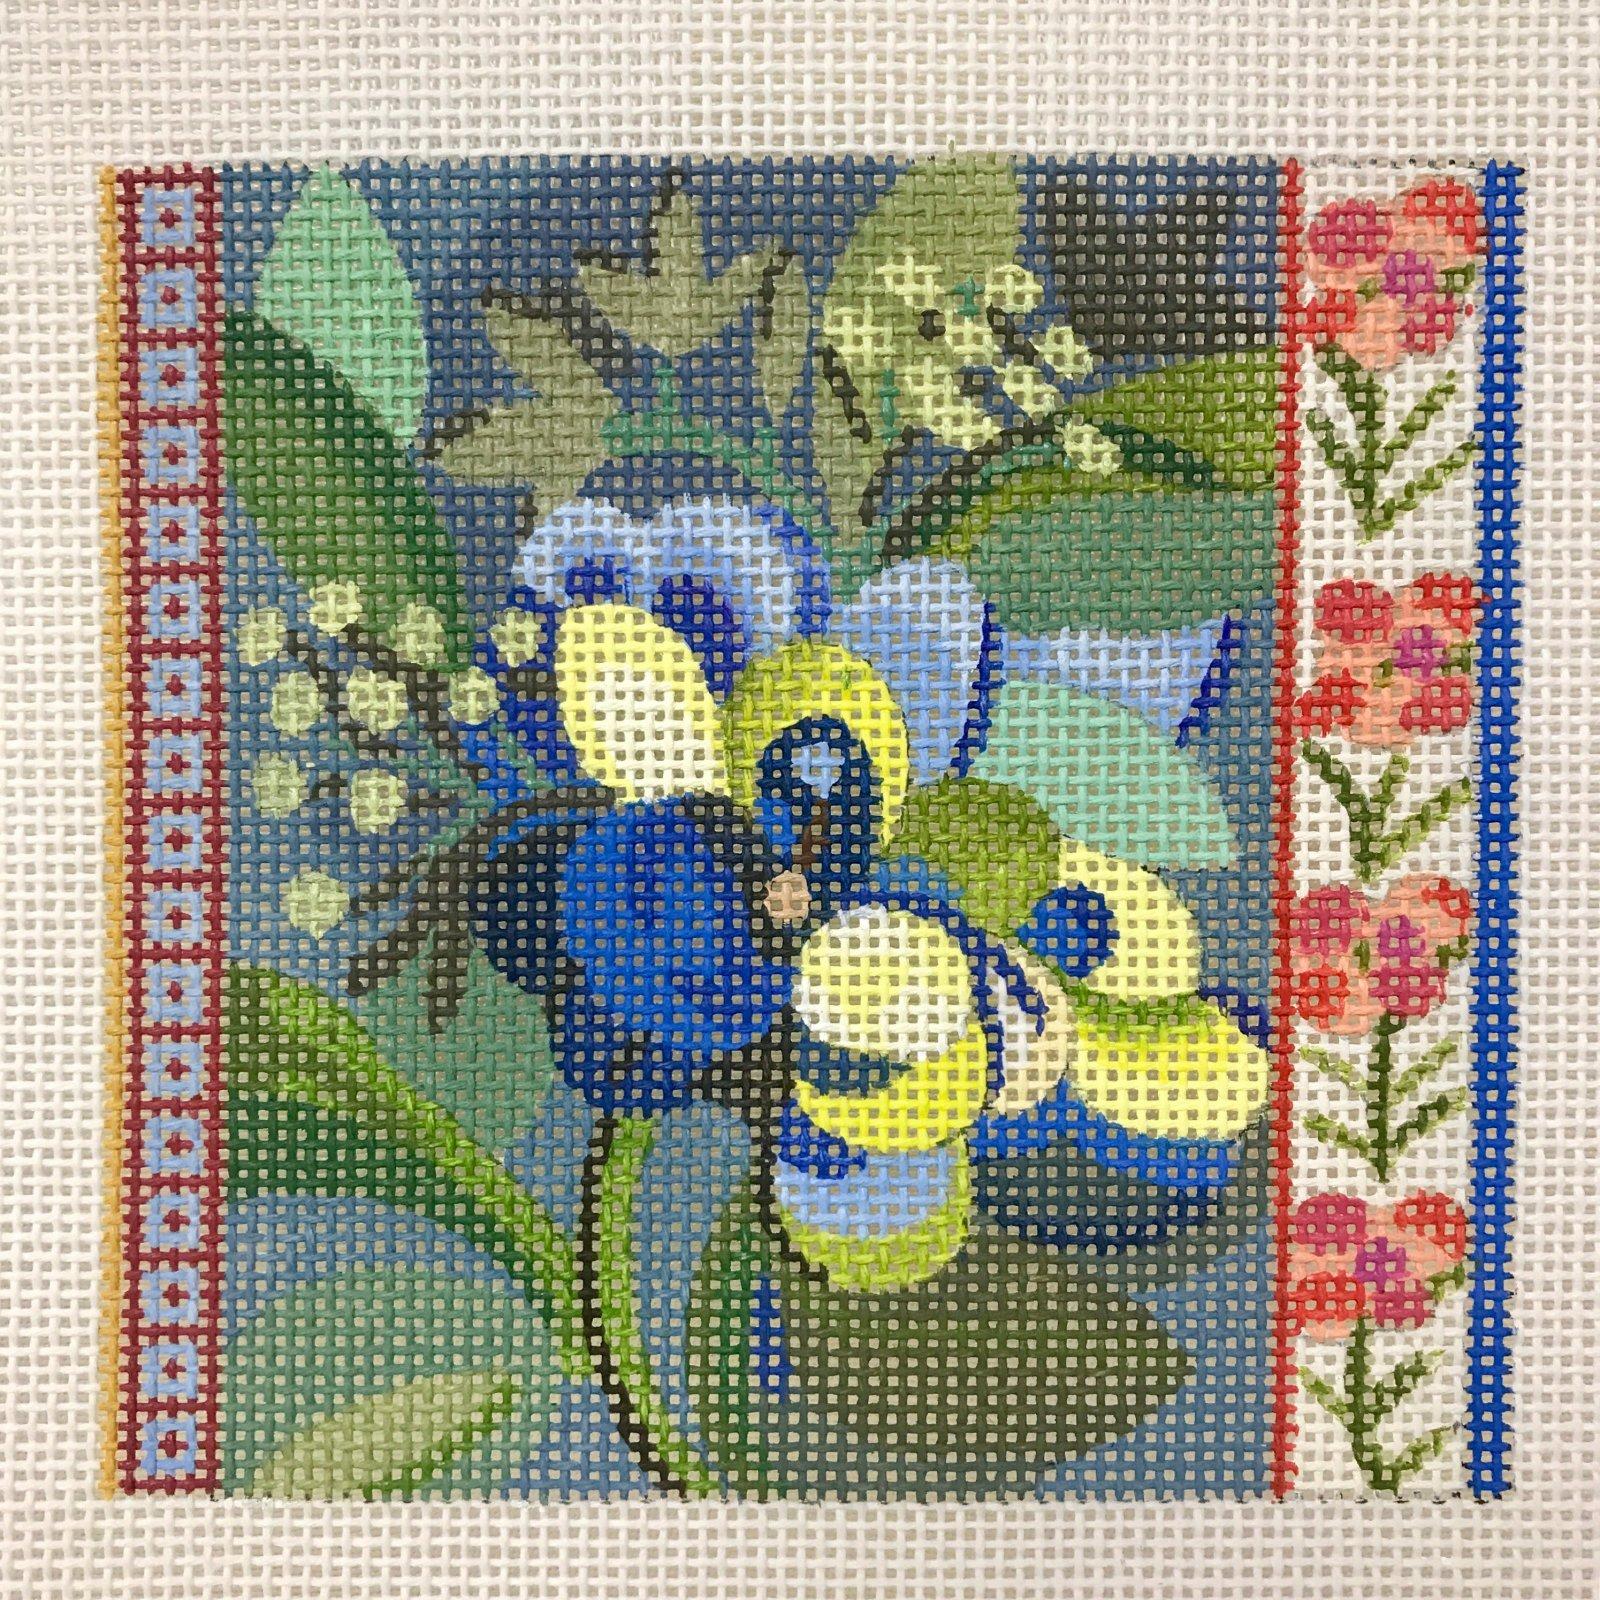 640B Floral Coaster